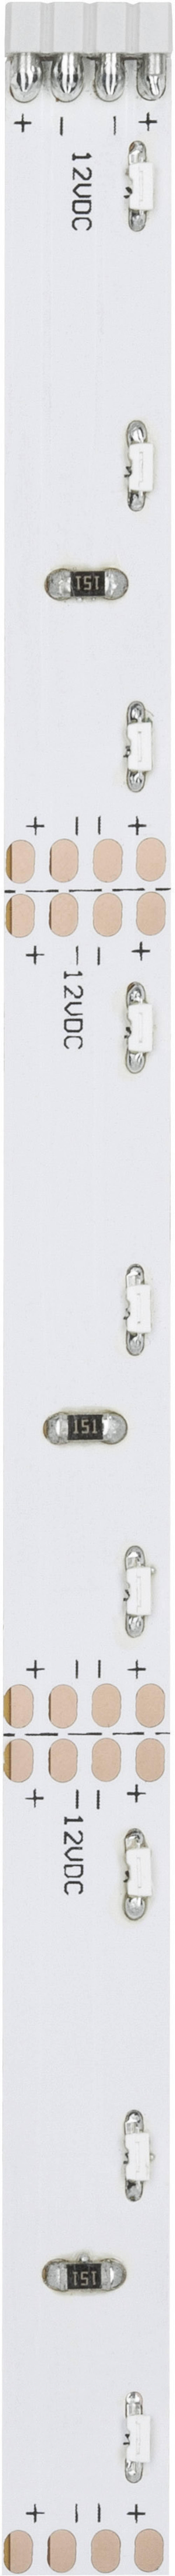 LED-trak z vtičem 12 V 50 cm toplo-bele barve Paulmann Sideview 70332